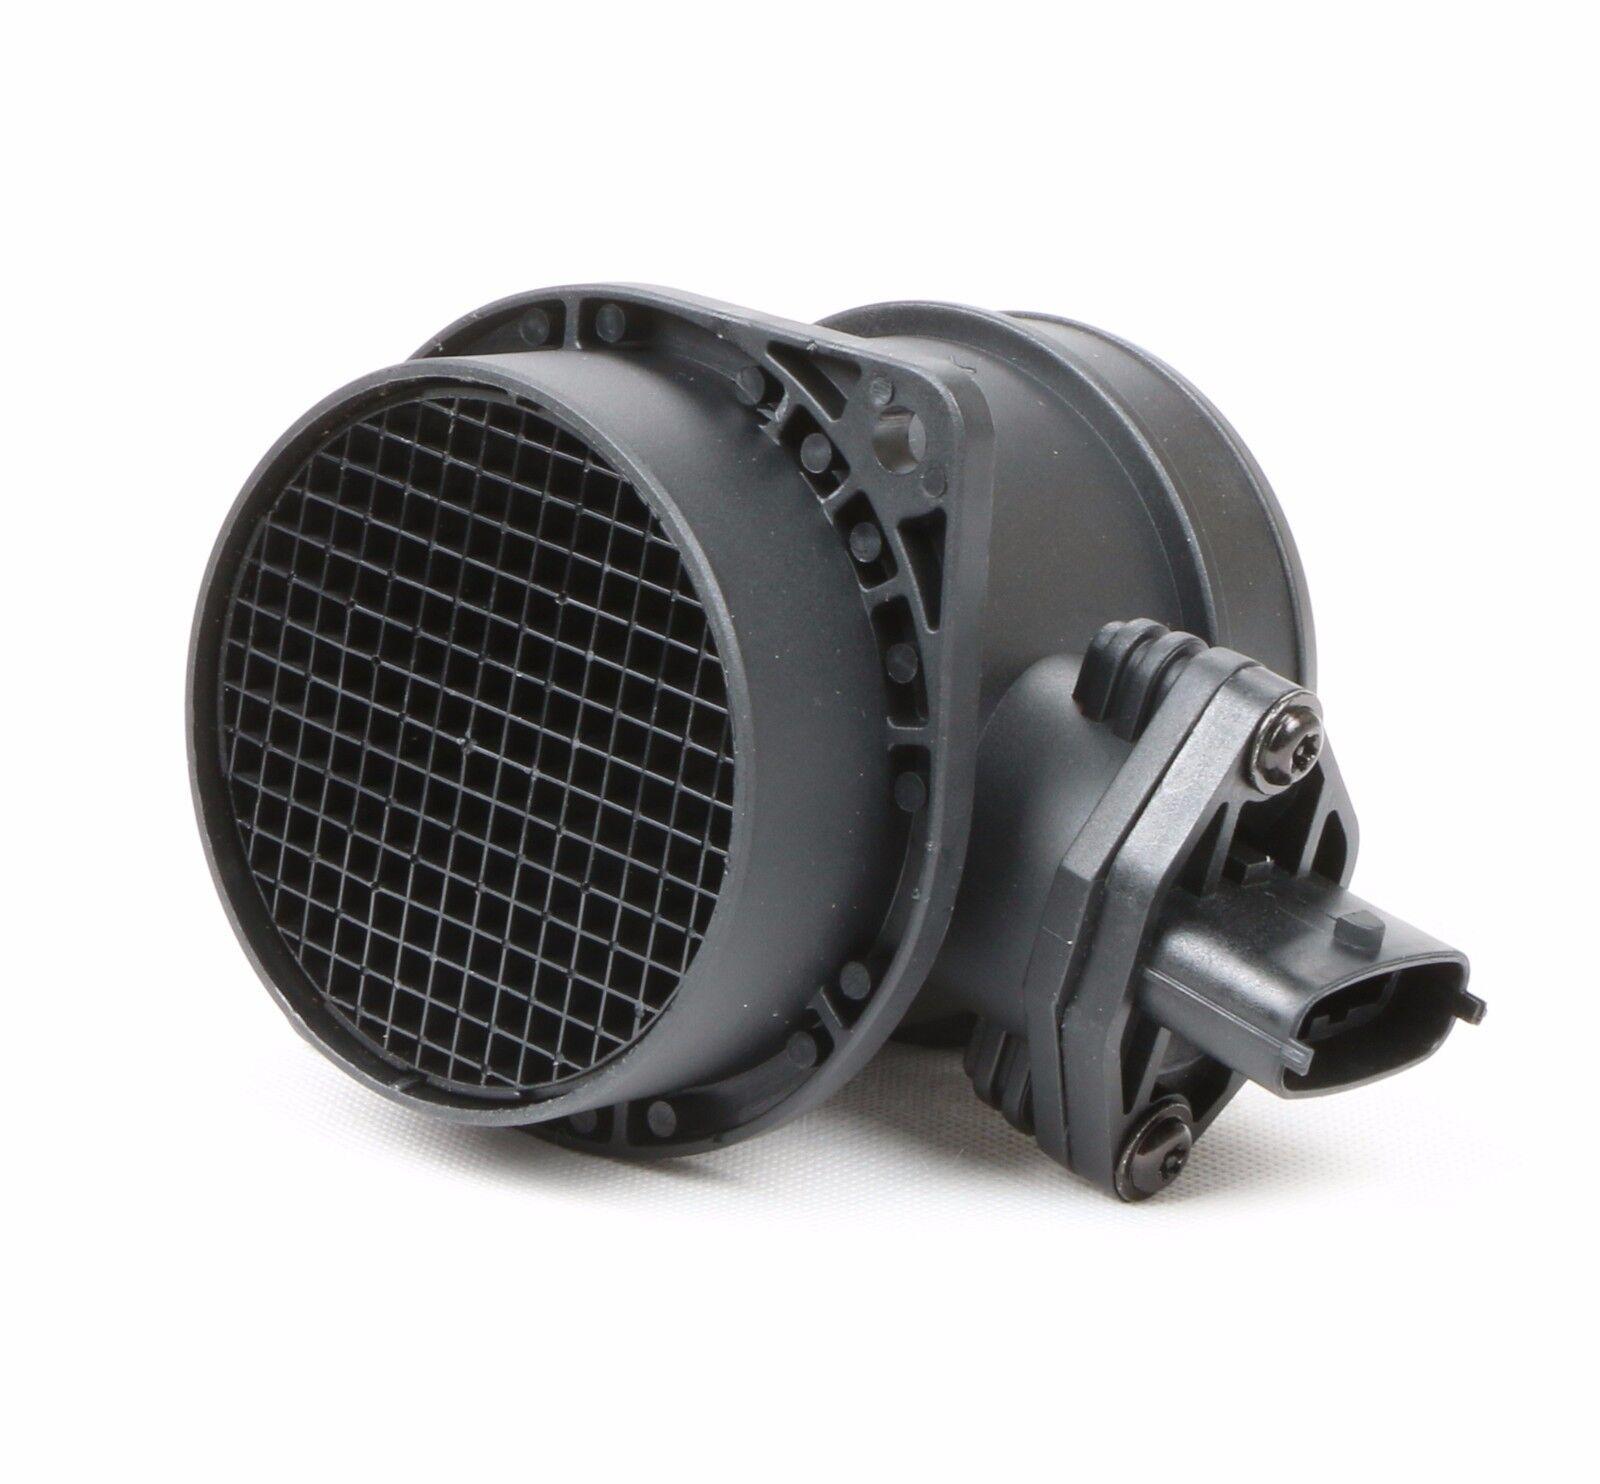 Mass air flow sensor meter maf for volvo s80 c70 v50 s40 xc90 v70 0280218088